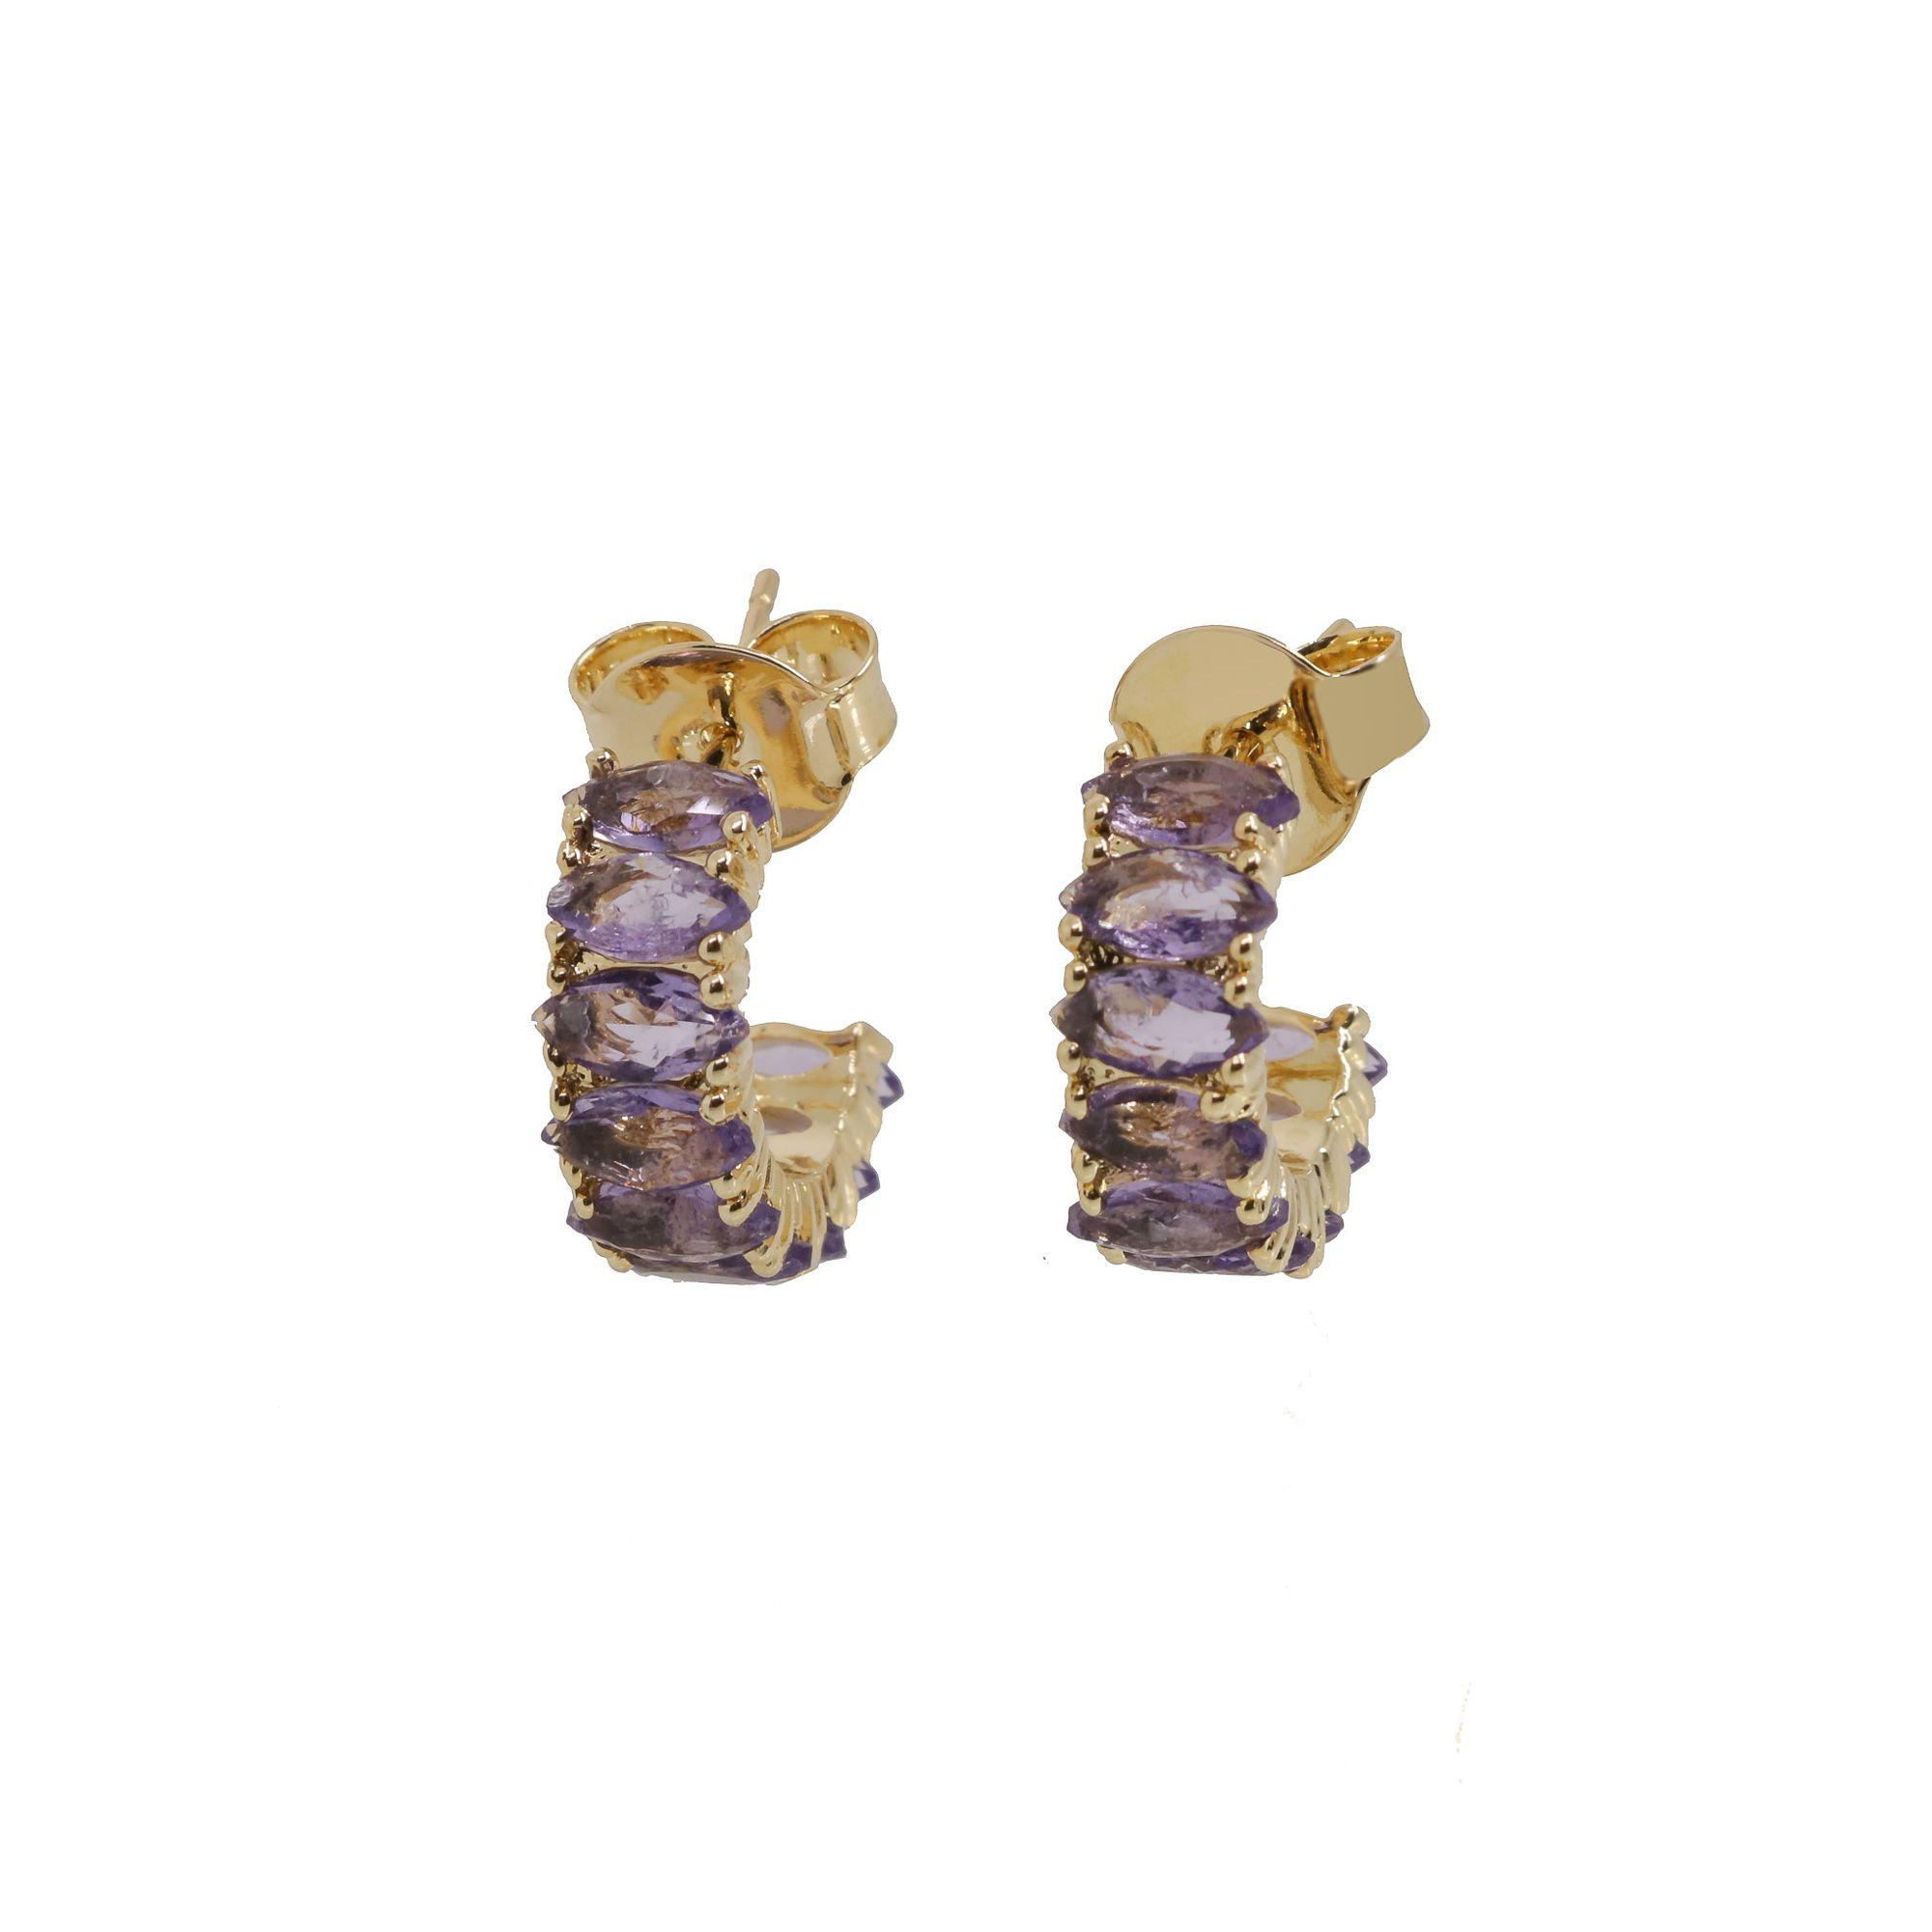 Brinco Argola Semi joia Fusion de Navette banhado a ouro 18k ou rhodium